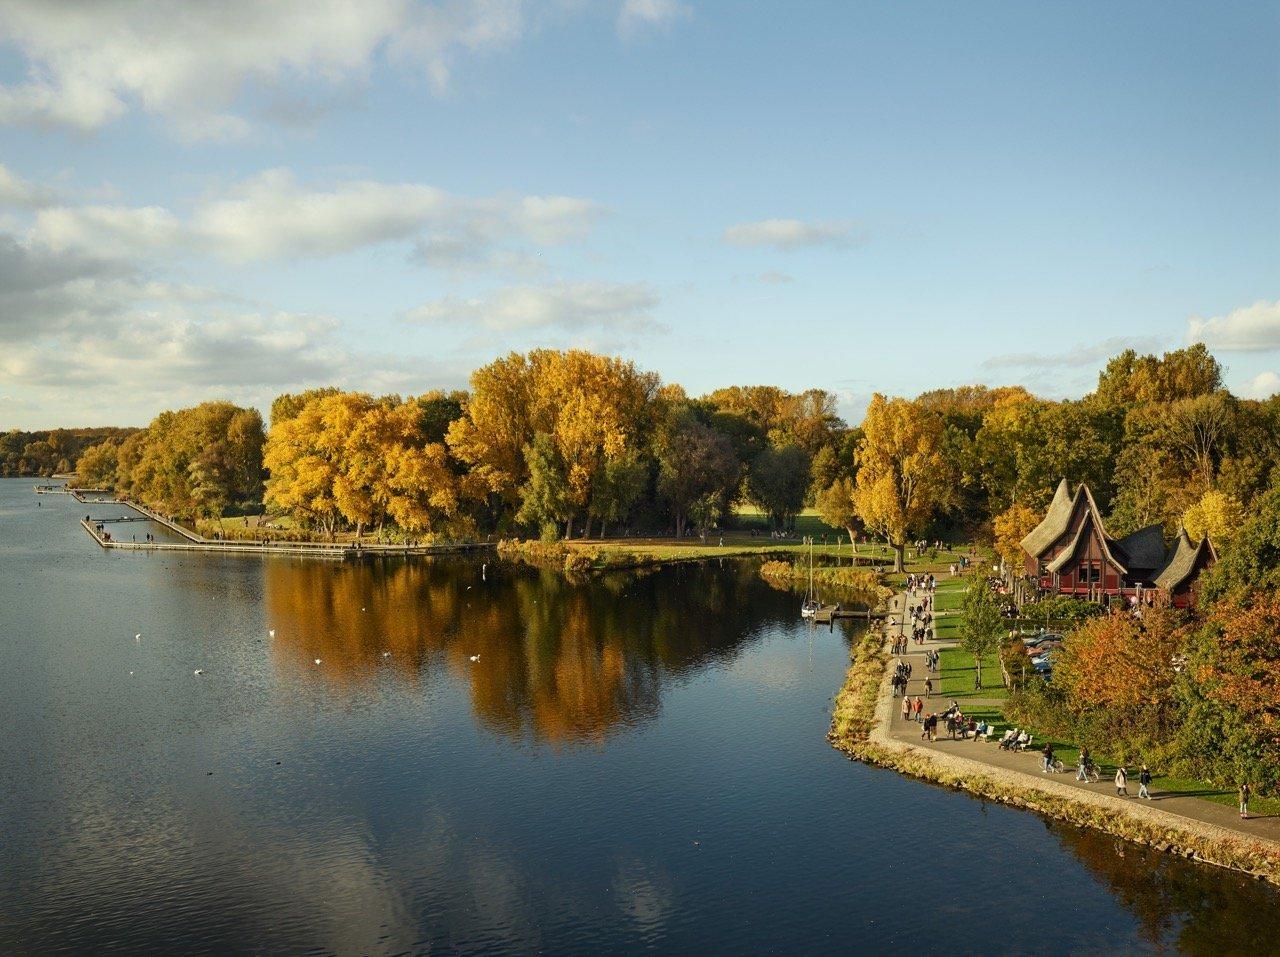 Kralingse Plas from the series Park © Jeroen Hofman